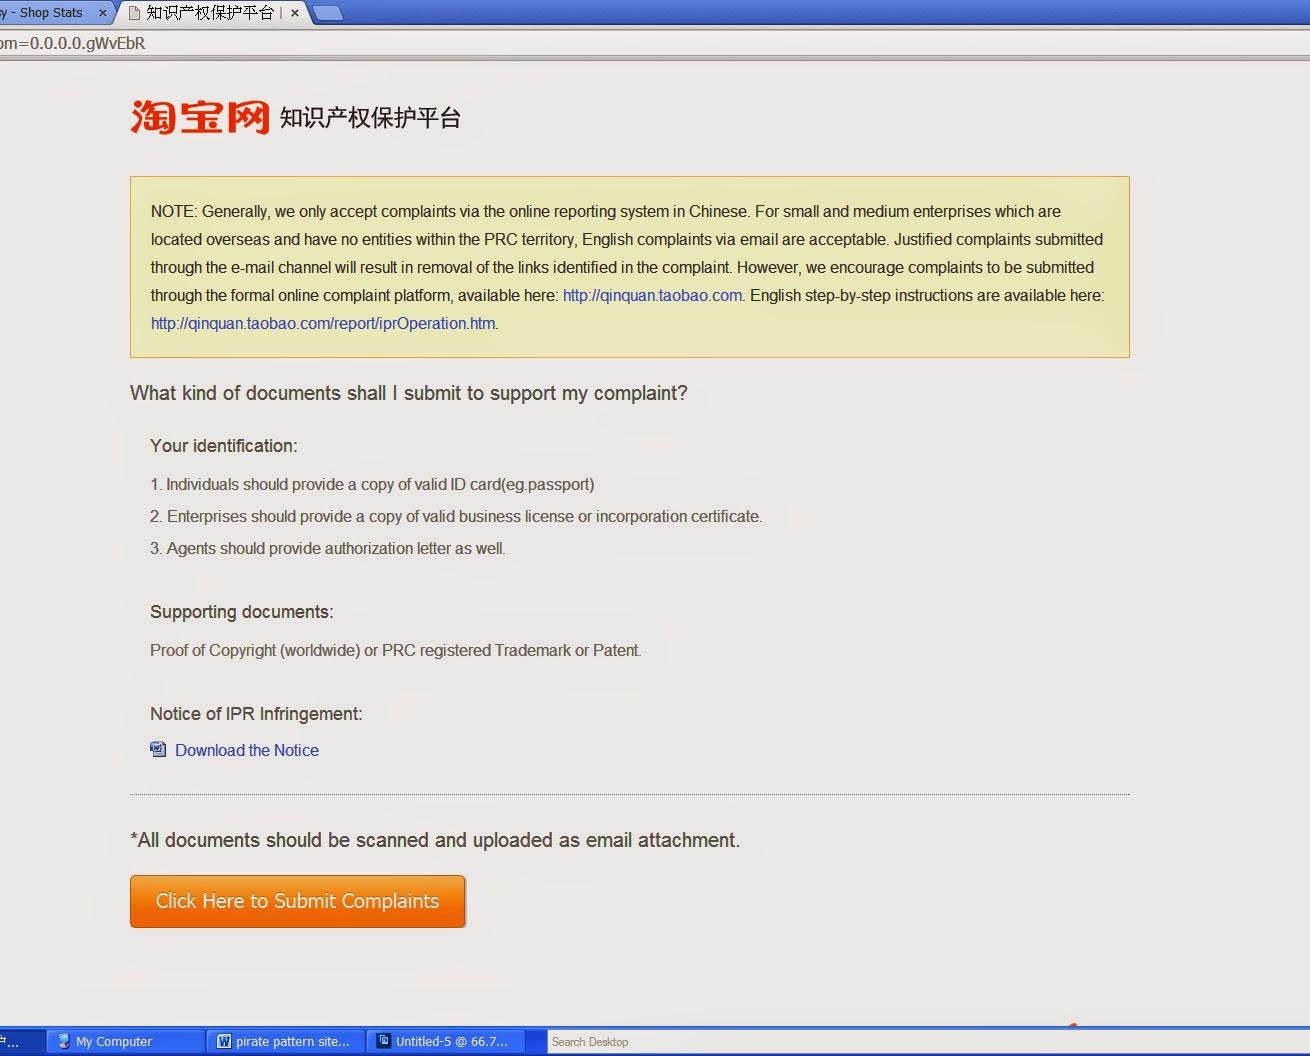 http://qinquan.taobao.com/SME?spm=0.0.0.0.gWvEbR